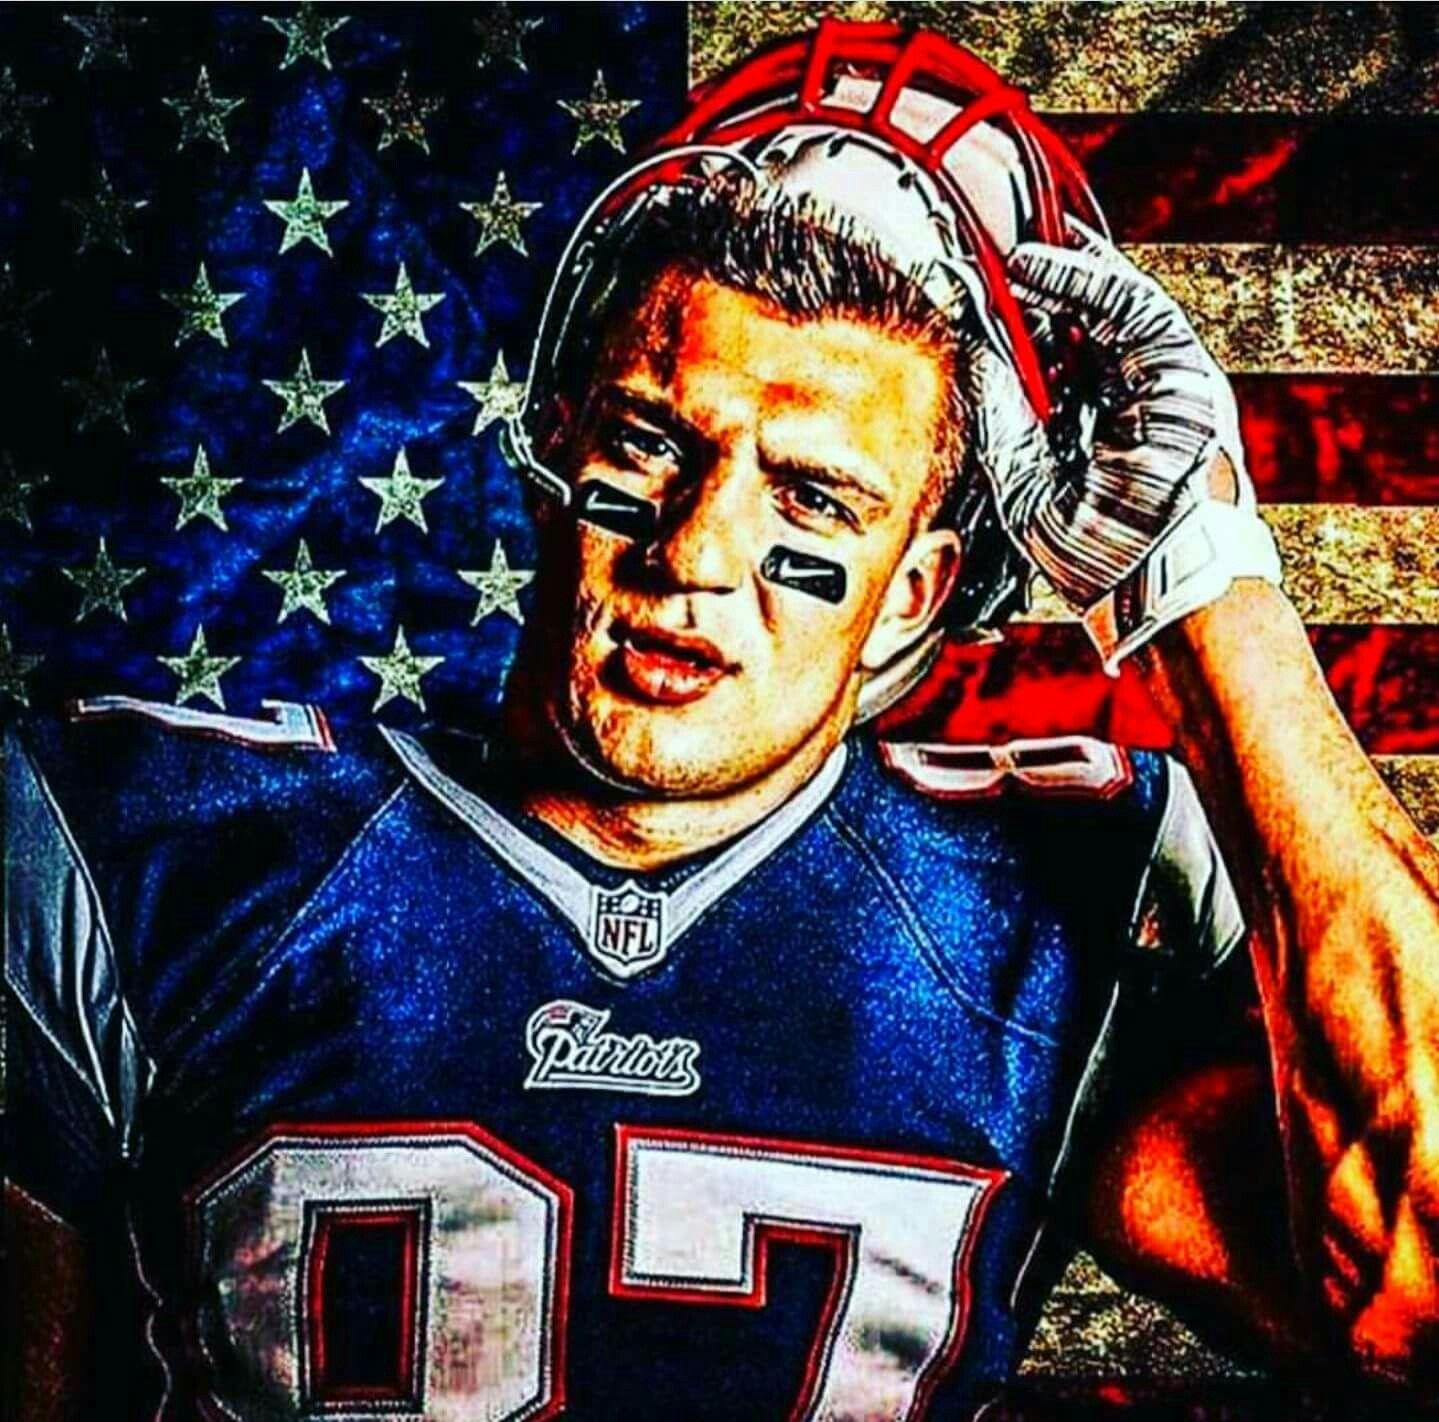 Pin By Alan Rego On Rob Gronkowski Gronk Patriots New England Patroits New England Patriots